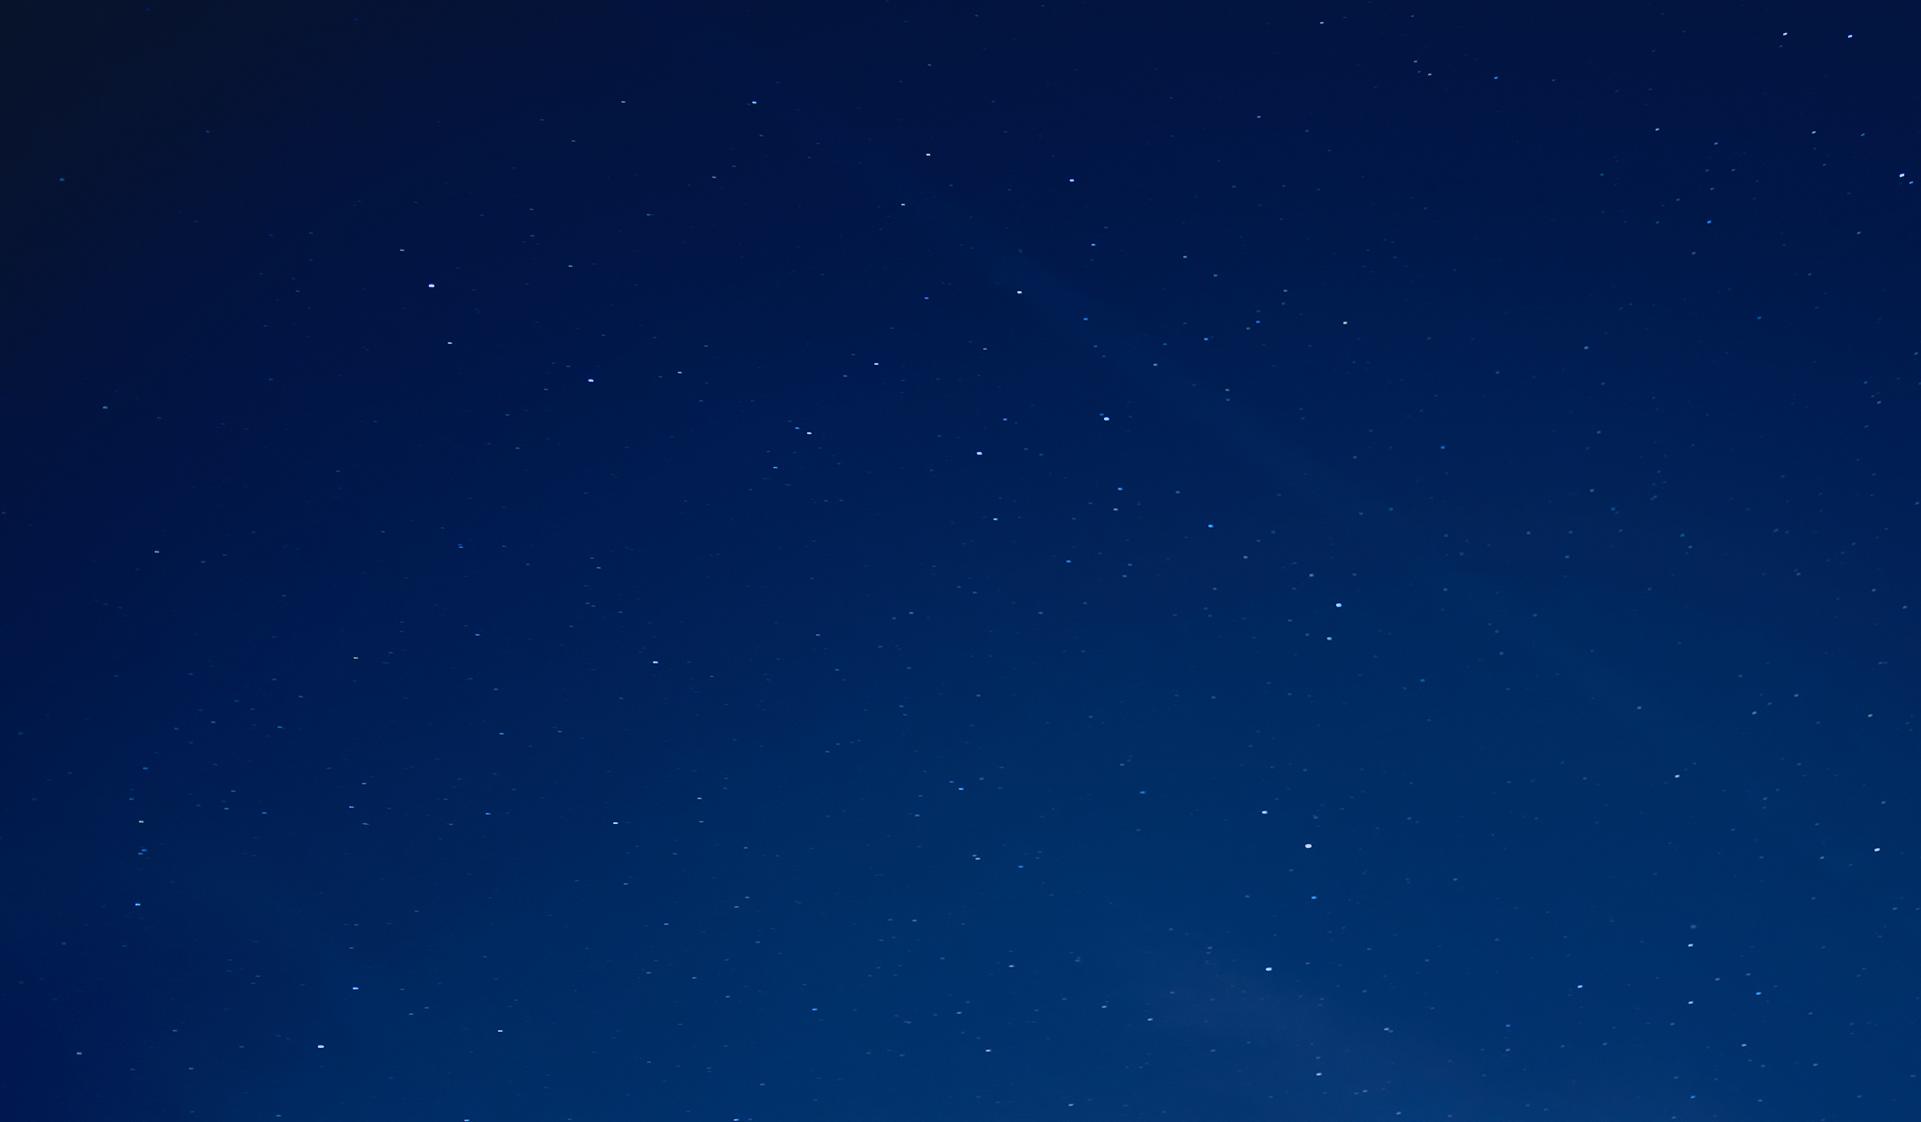 Protecht-bg-night-sky-dark-blue-wave